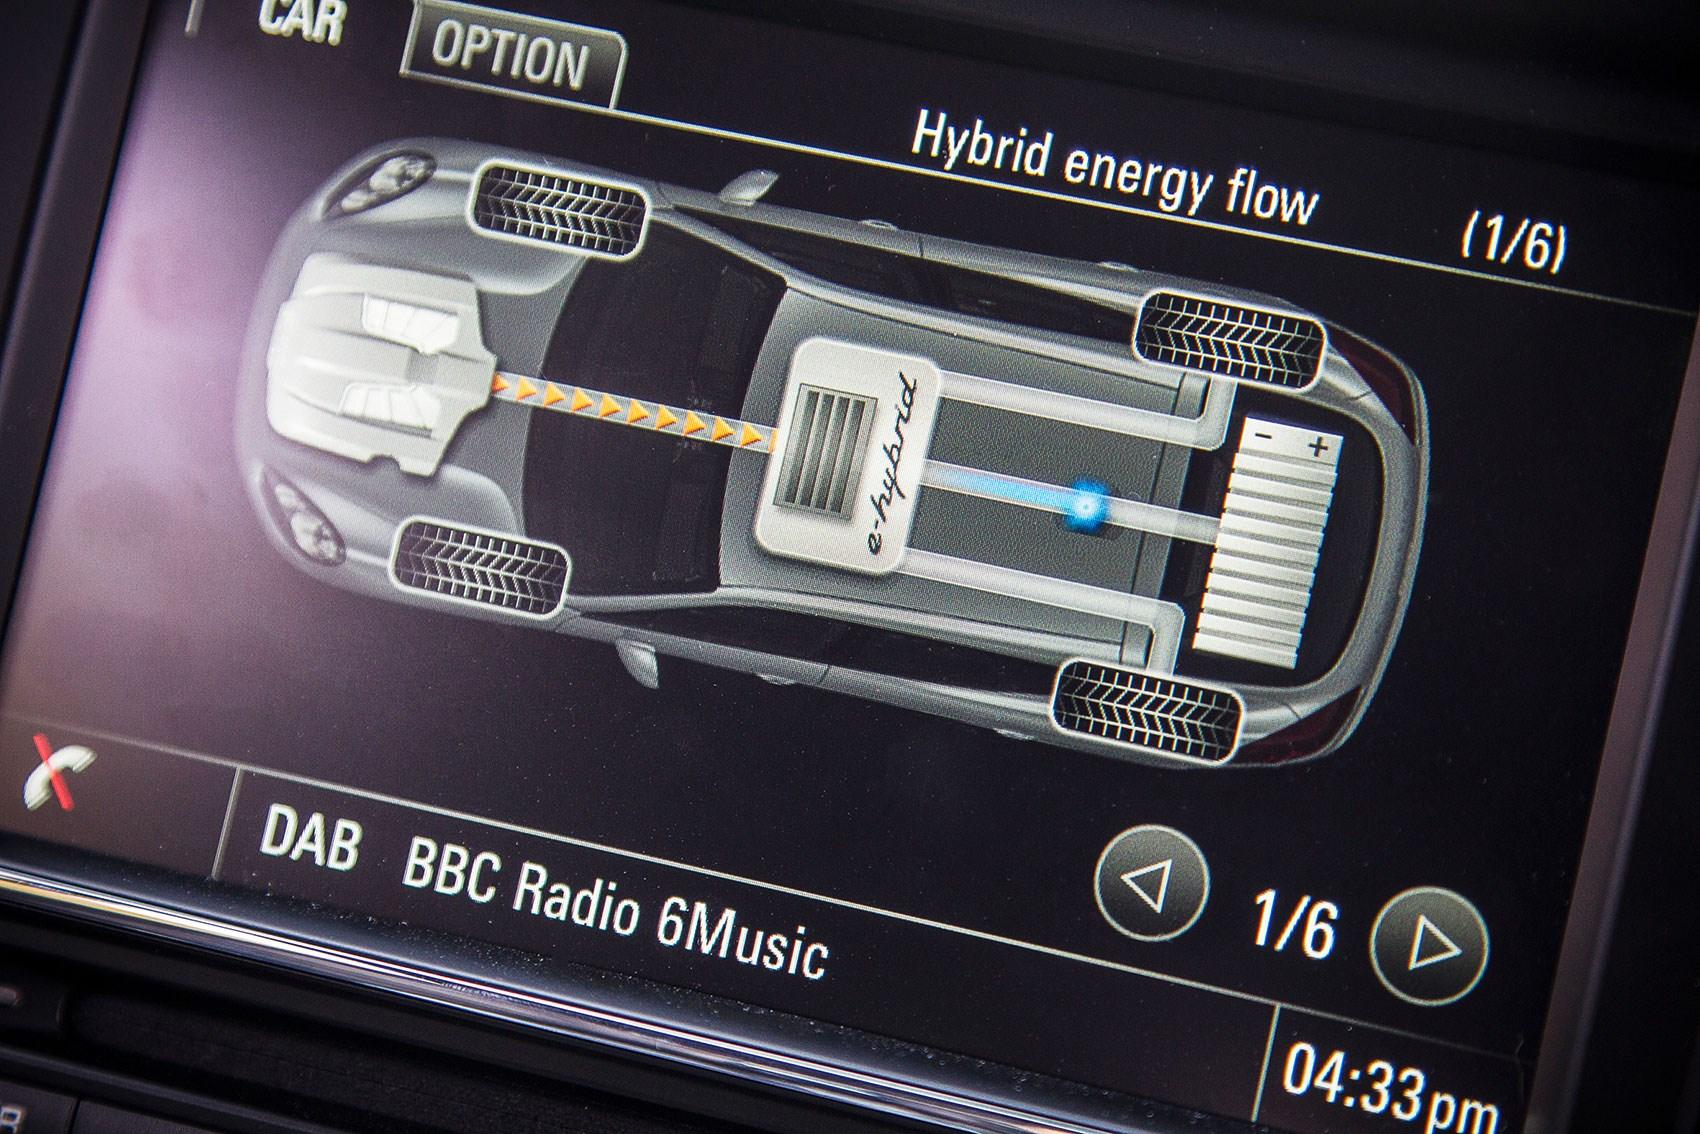 Tesla Model S Vs Bmw M5 Porsche Panamera Triple Test Review 2015 Land Rover Discovery Radio Wiring Hybrid Energy Flow Lets You Chart Panameras Motive Force